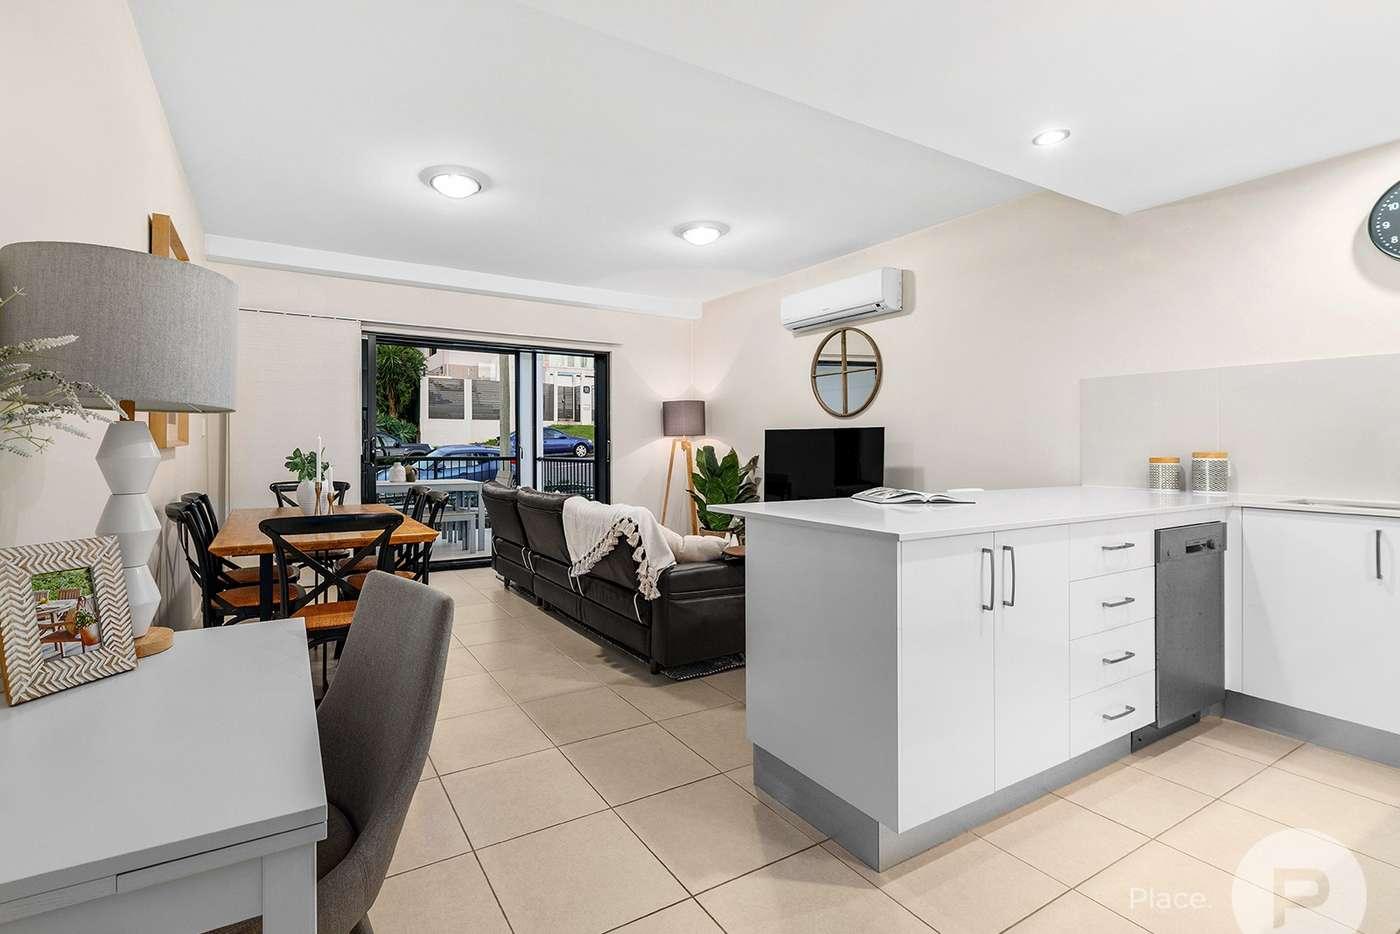 Fifth view of Homely unit listing, 5/15 Raffles Street, Mount Gravatt East QLD 4122